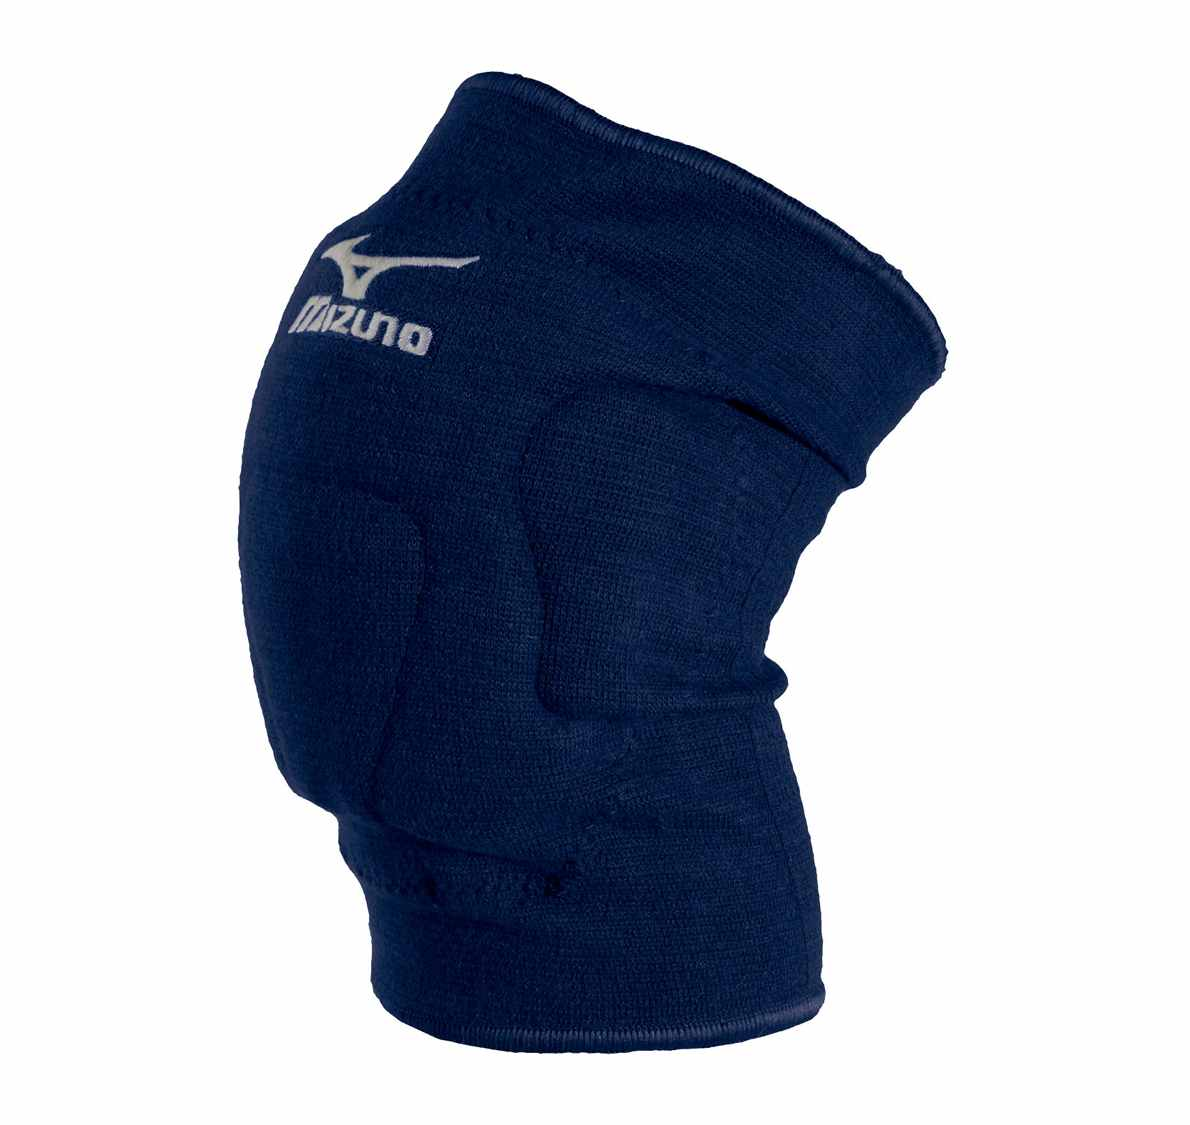 Mizuno VS1 Kneepad Z59SS89114 XL